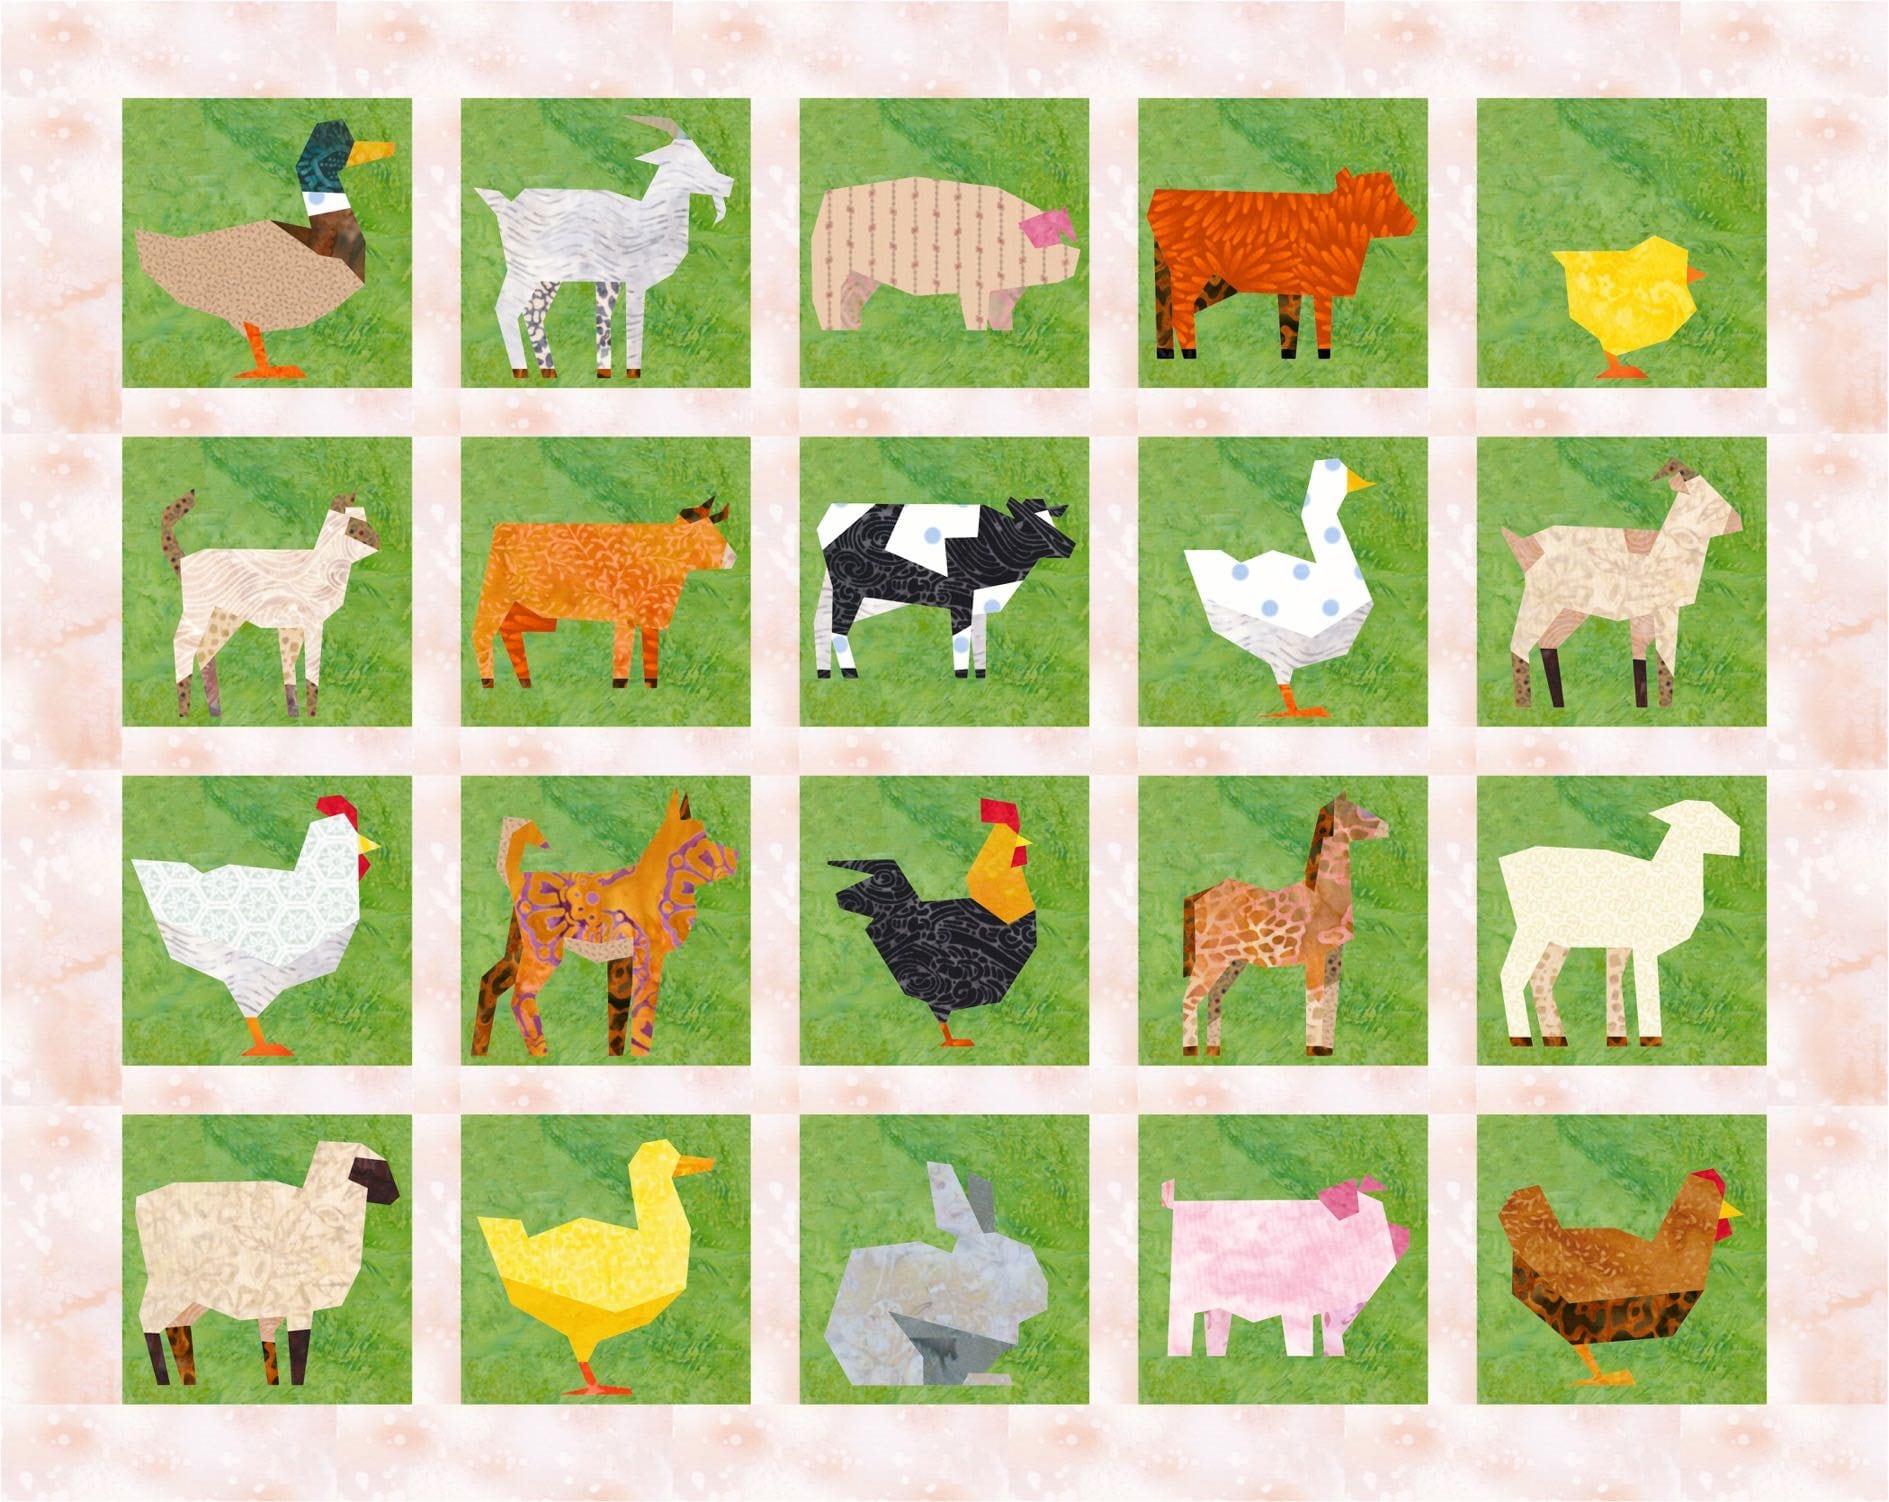 20 Farm Animals Quilt Block Patterns Cows Sheep Chickens